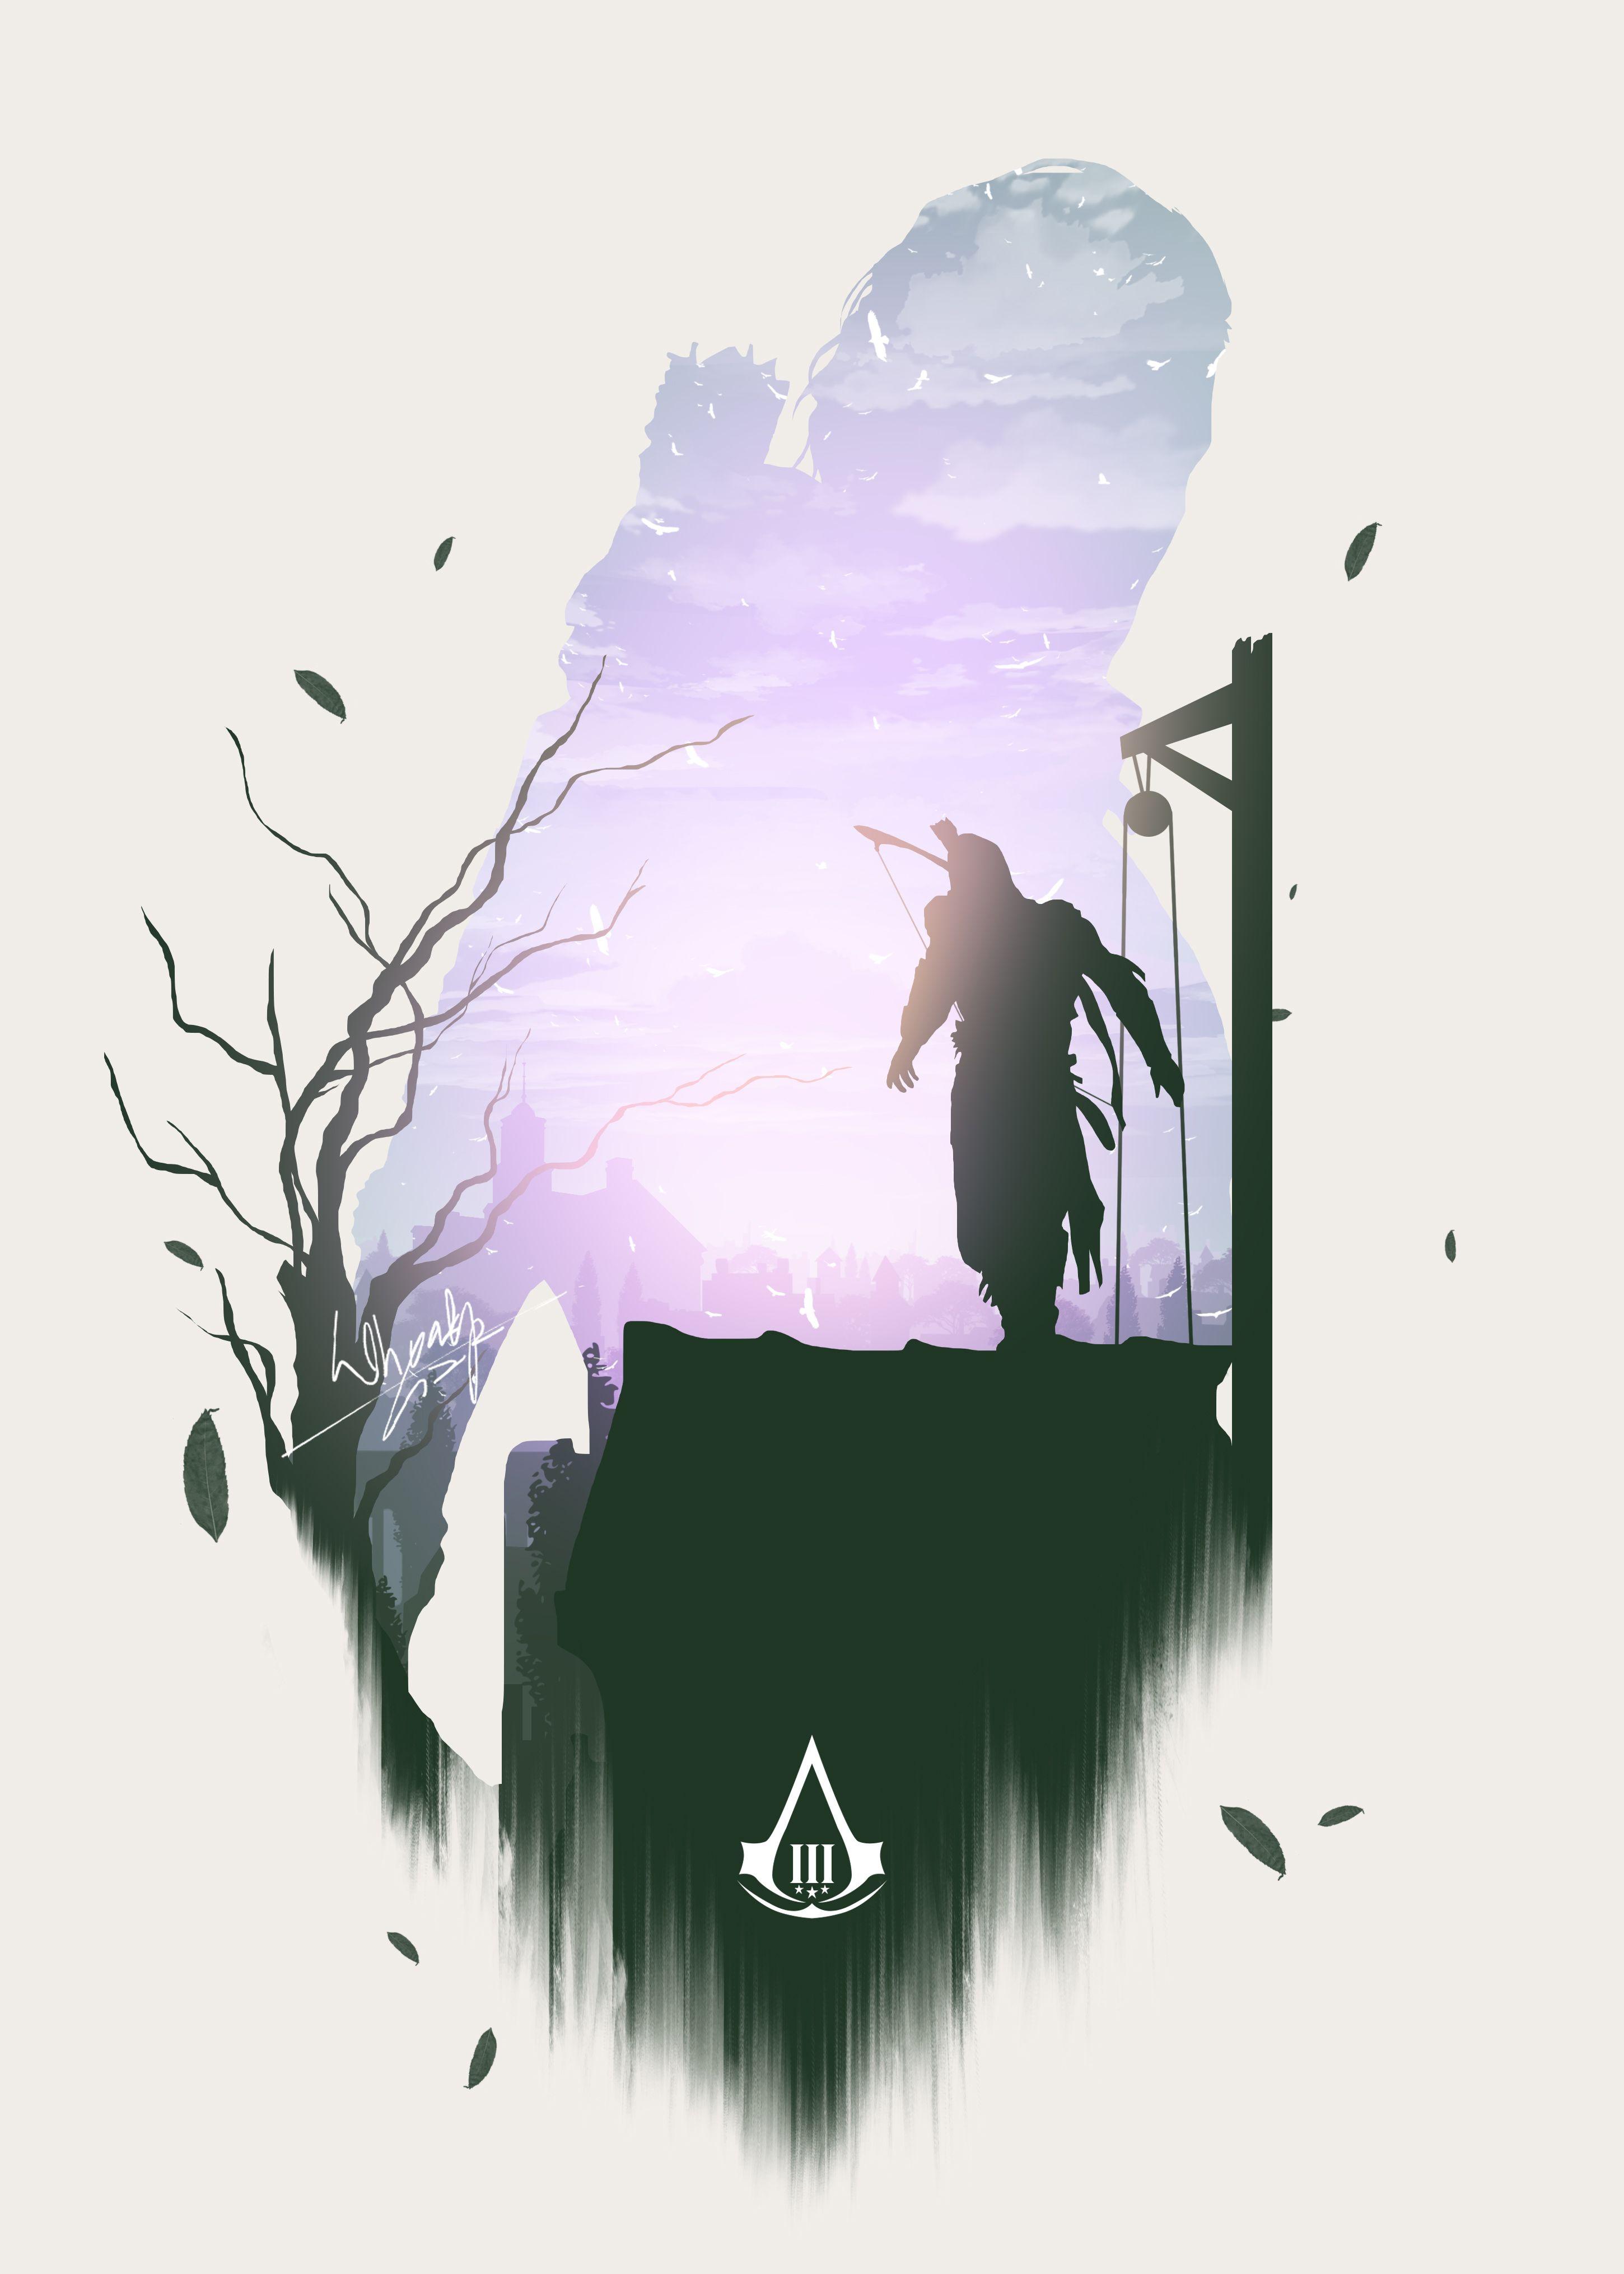 Gaming Silhouette Illusion